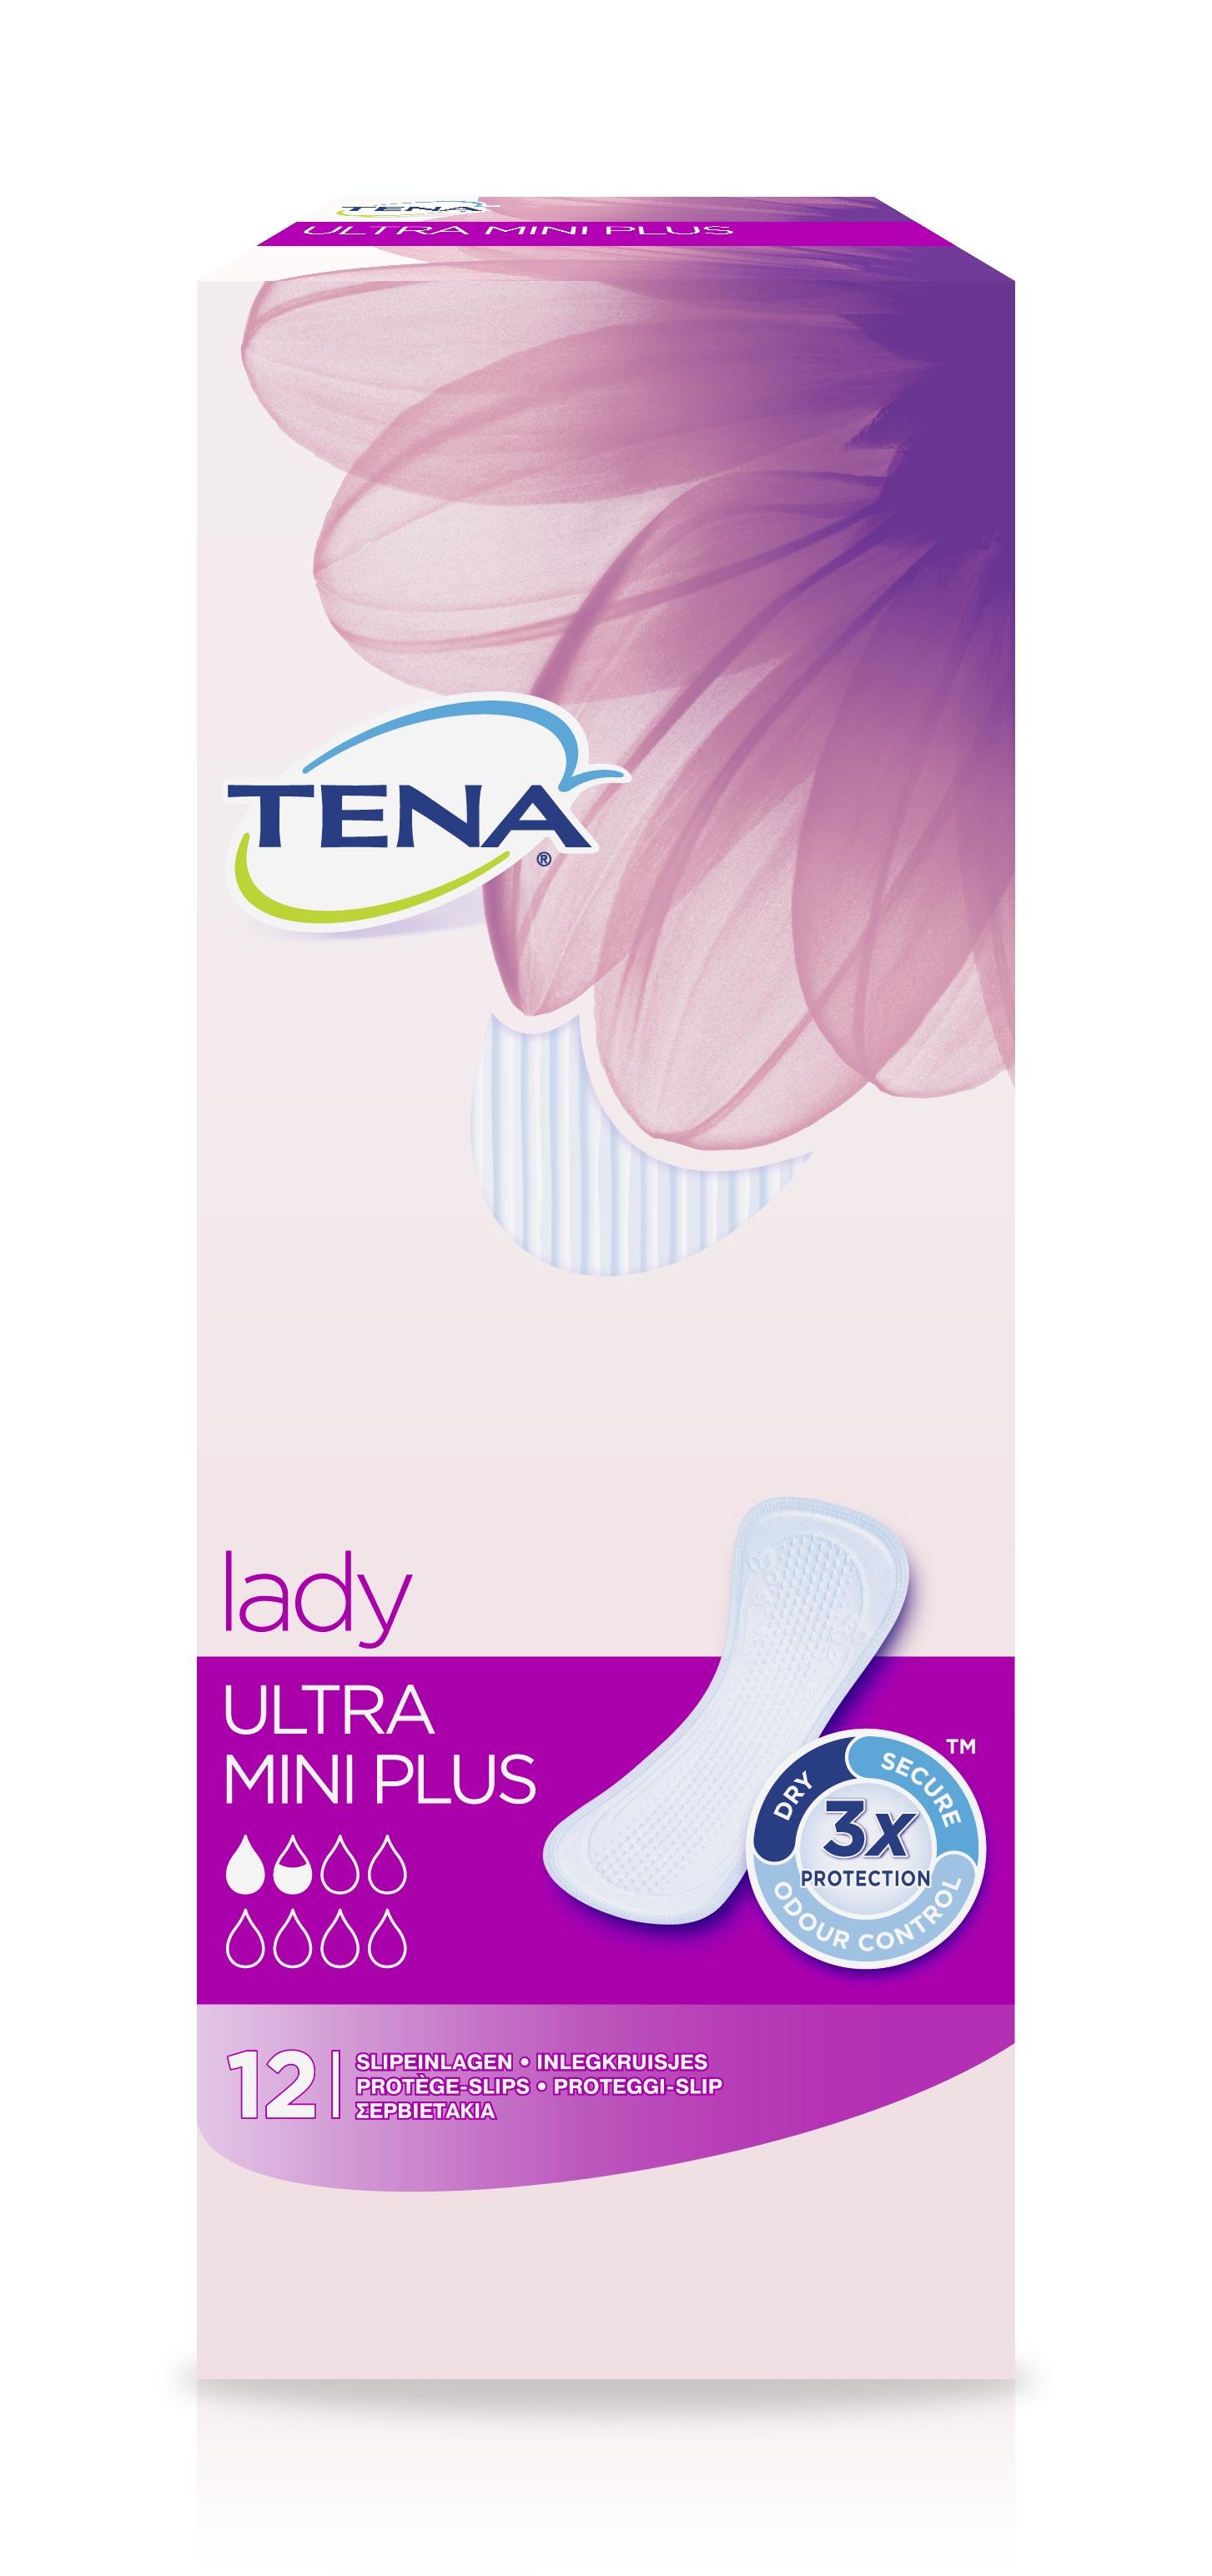 TENA Lady UltraMiniPlus